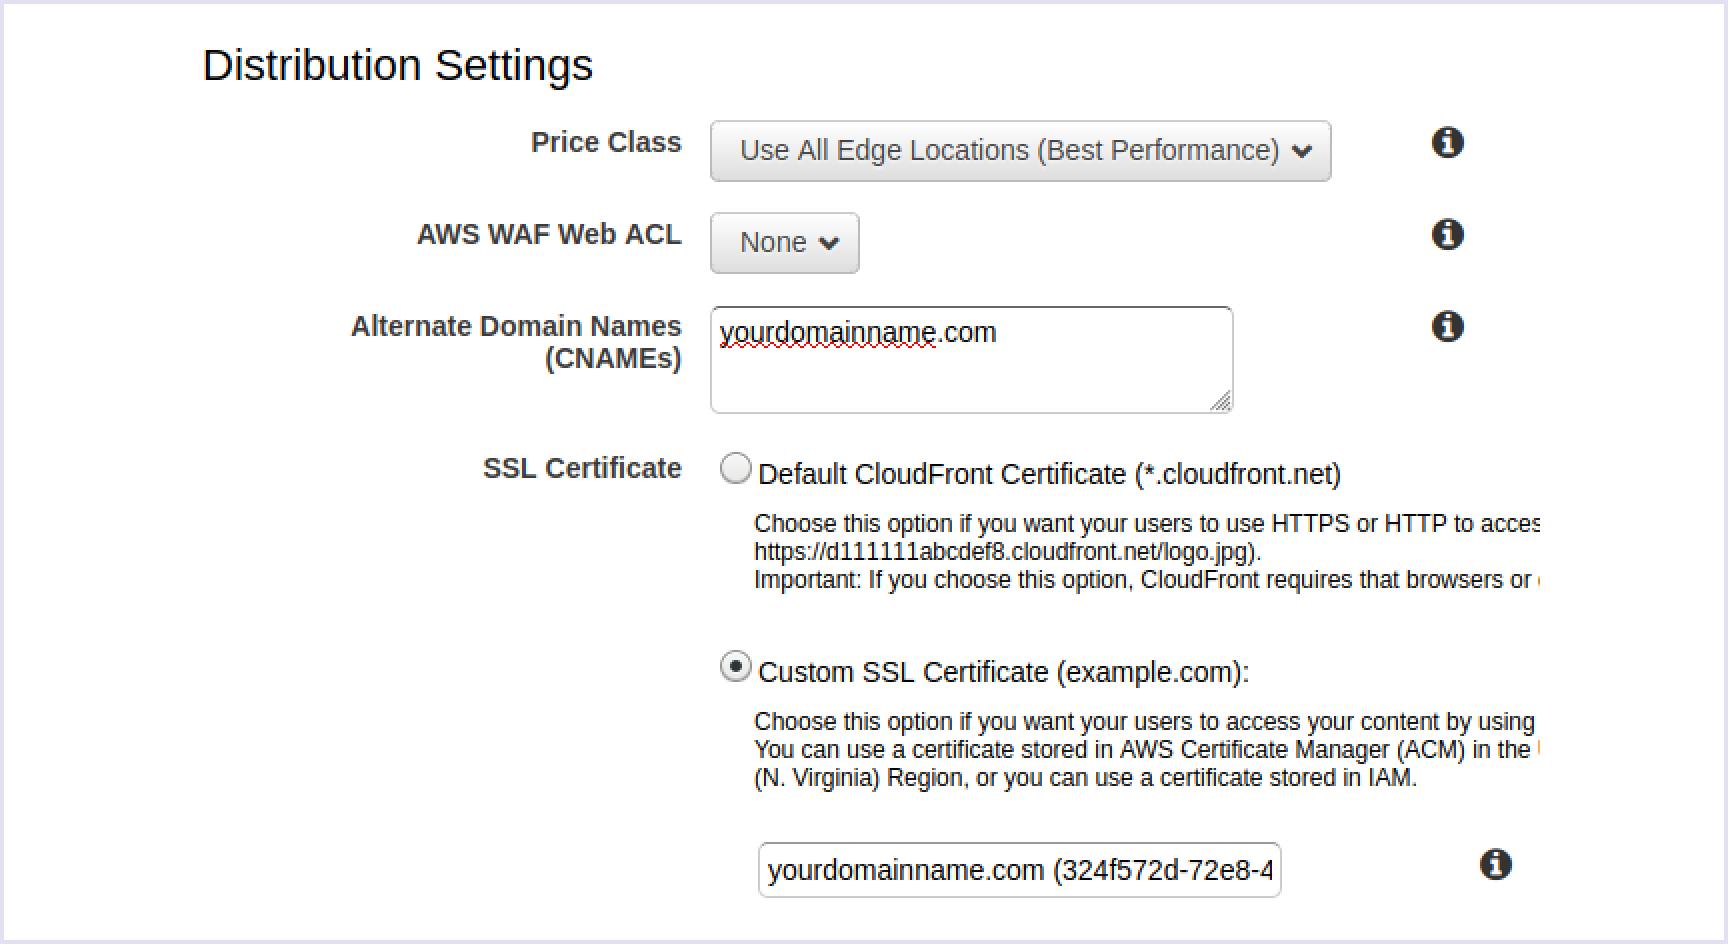 Choosing the Custom SSL certificate